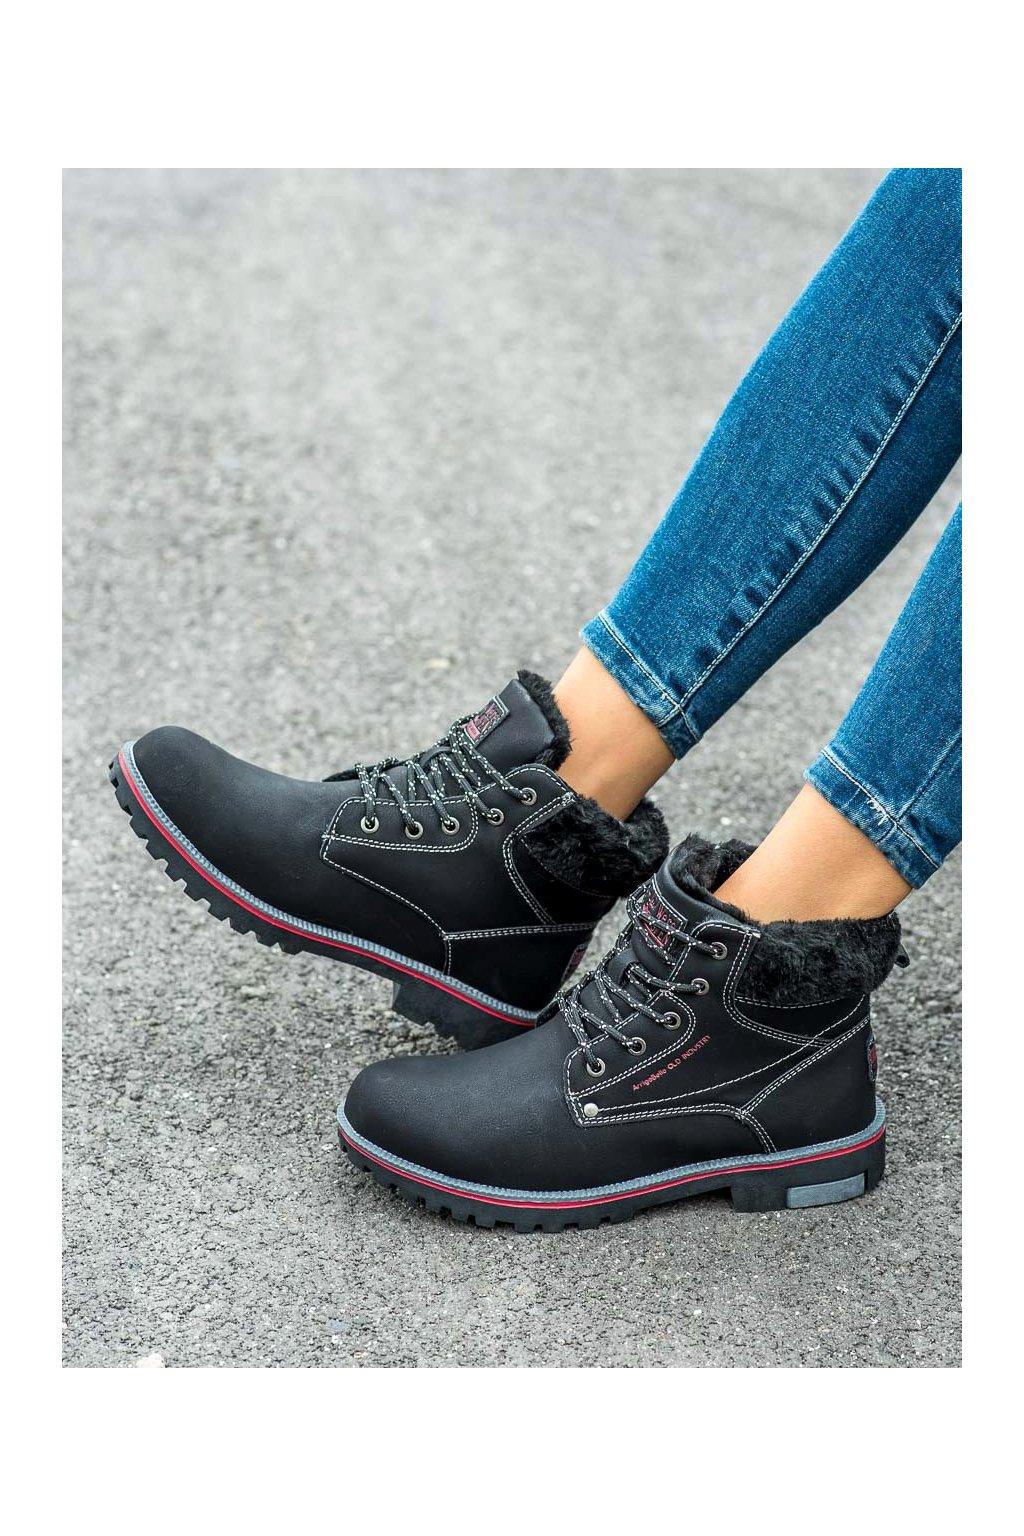 Čierne trekkingové dámske topánky Arrigo bello kod BM9264B